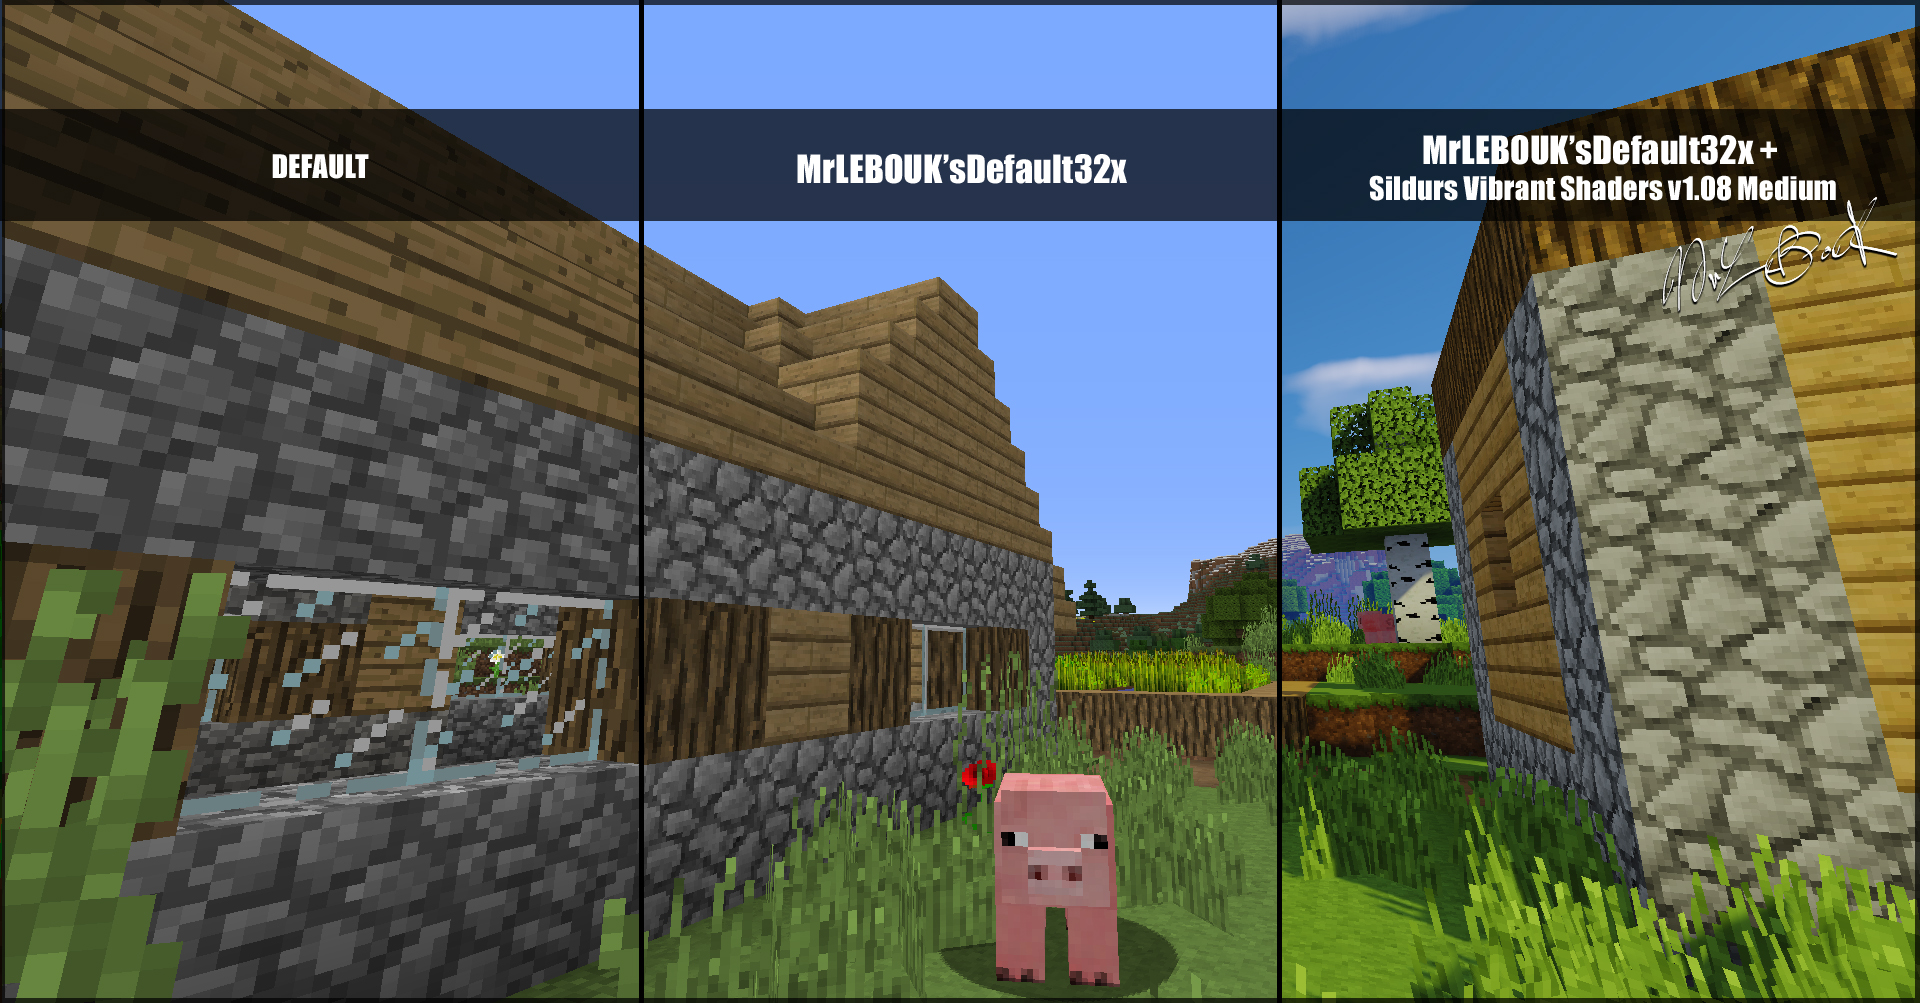 Village plaine et cochon : Resource pack minecraft MrLEBOUK'SDEFAUT32x